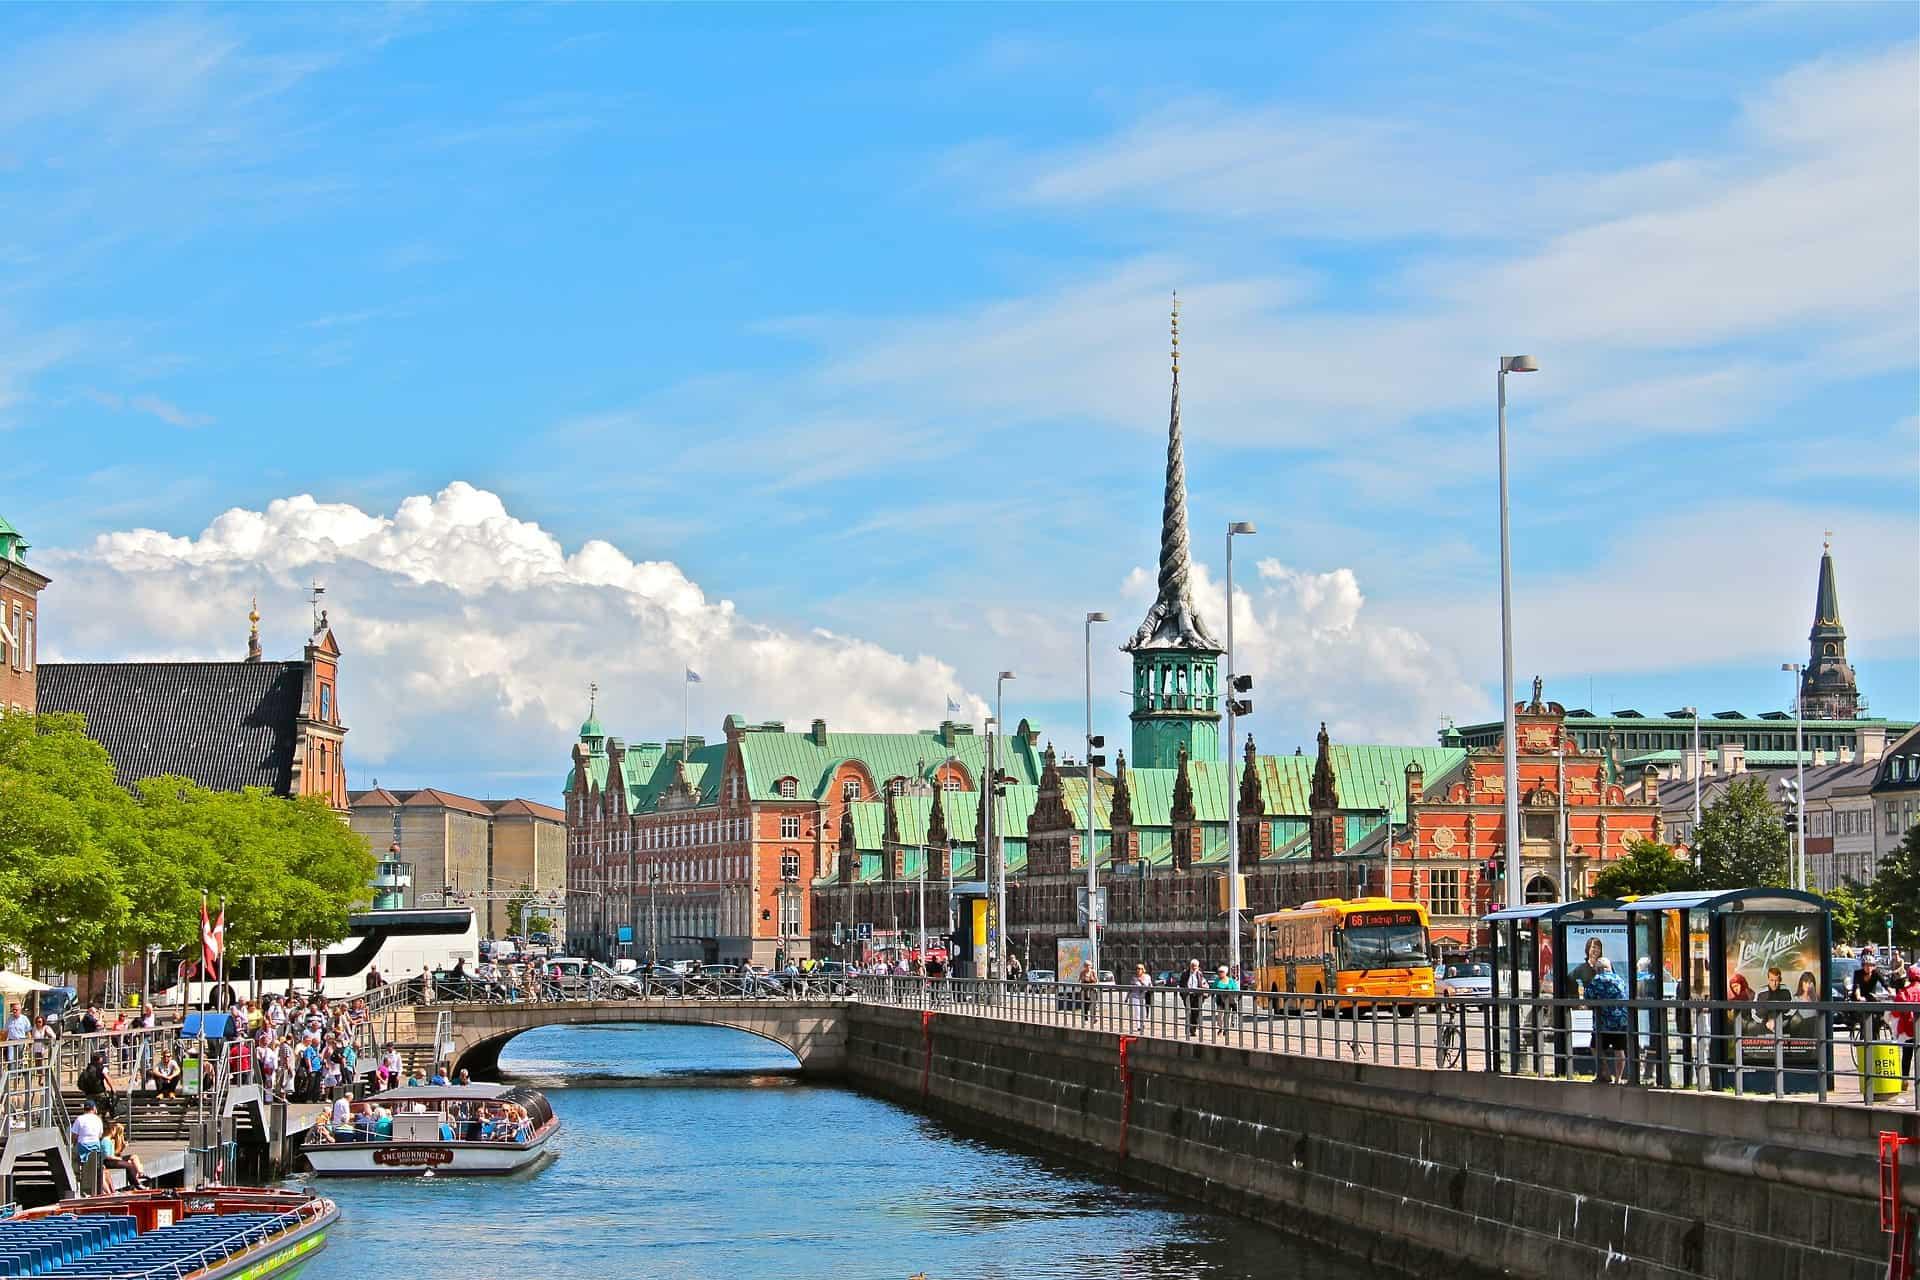 Flug Köln Kopenhagen - nur 9,49€ Flüge zum Sonderpeis